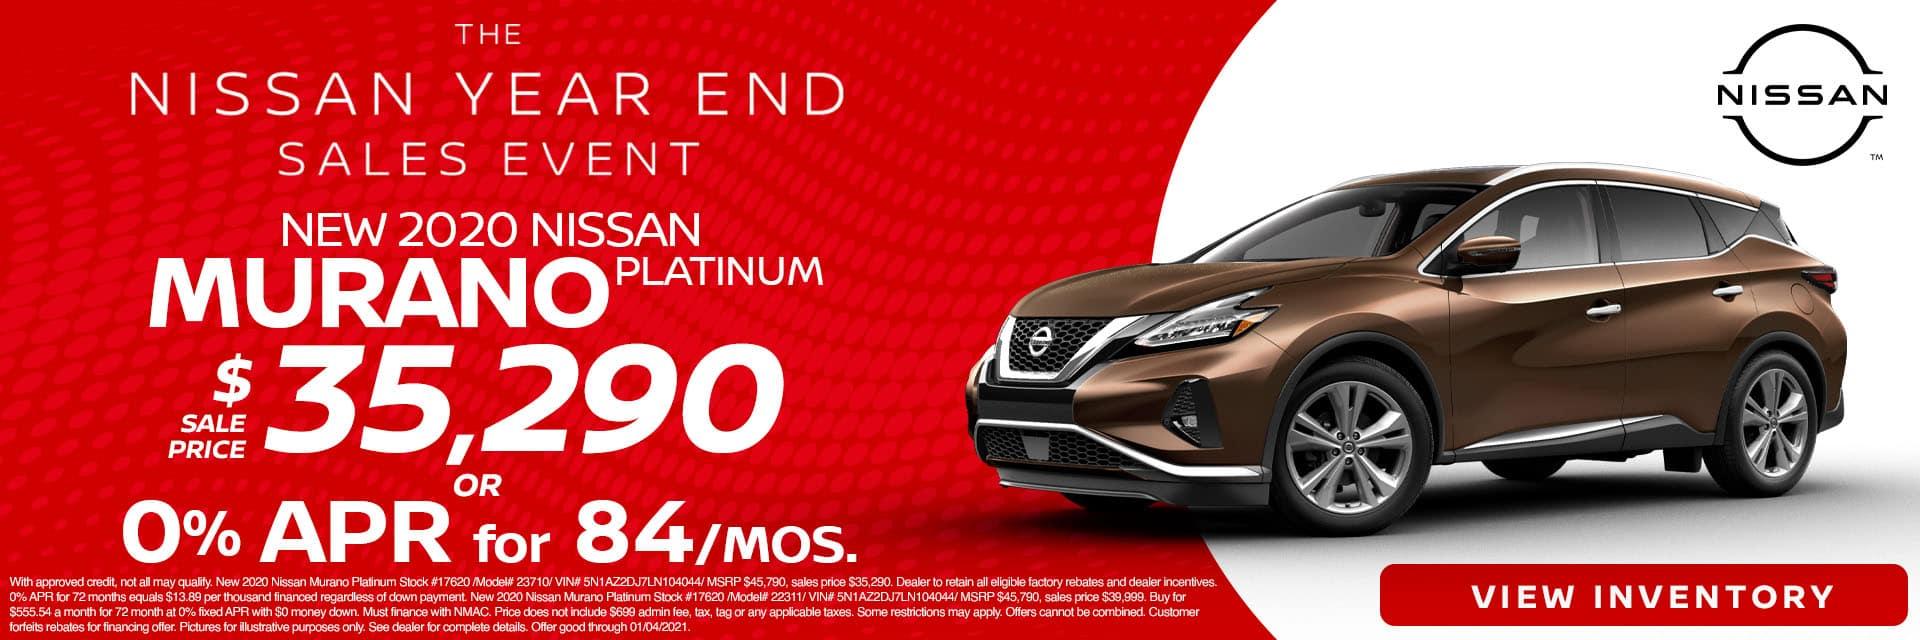 CNSN-December 2020-2020 Nissan Murano